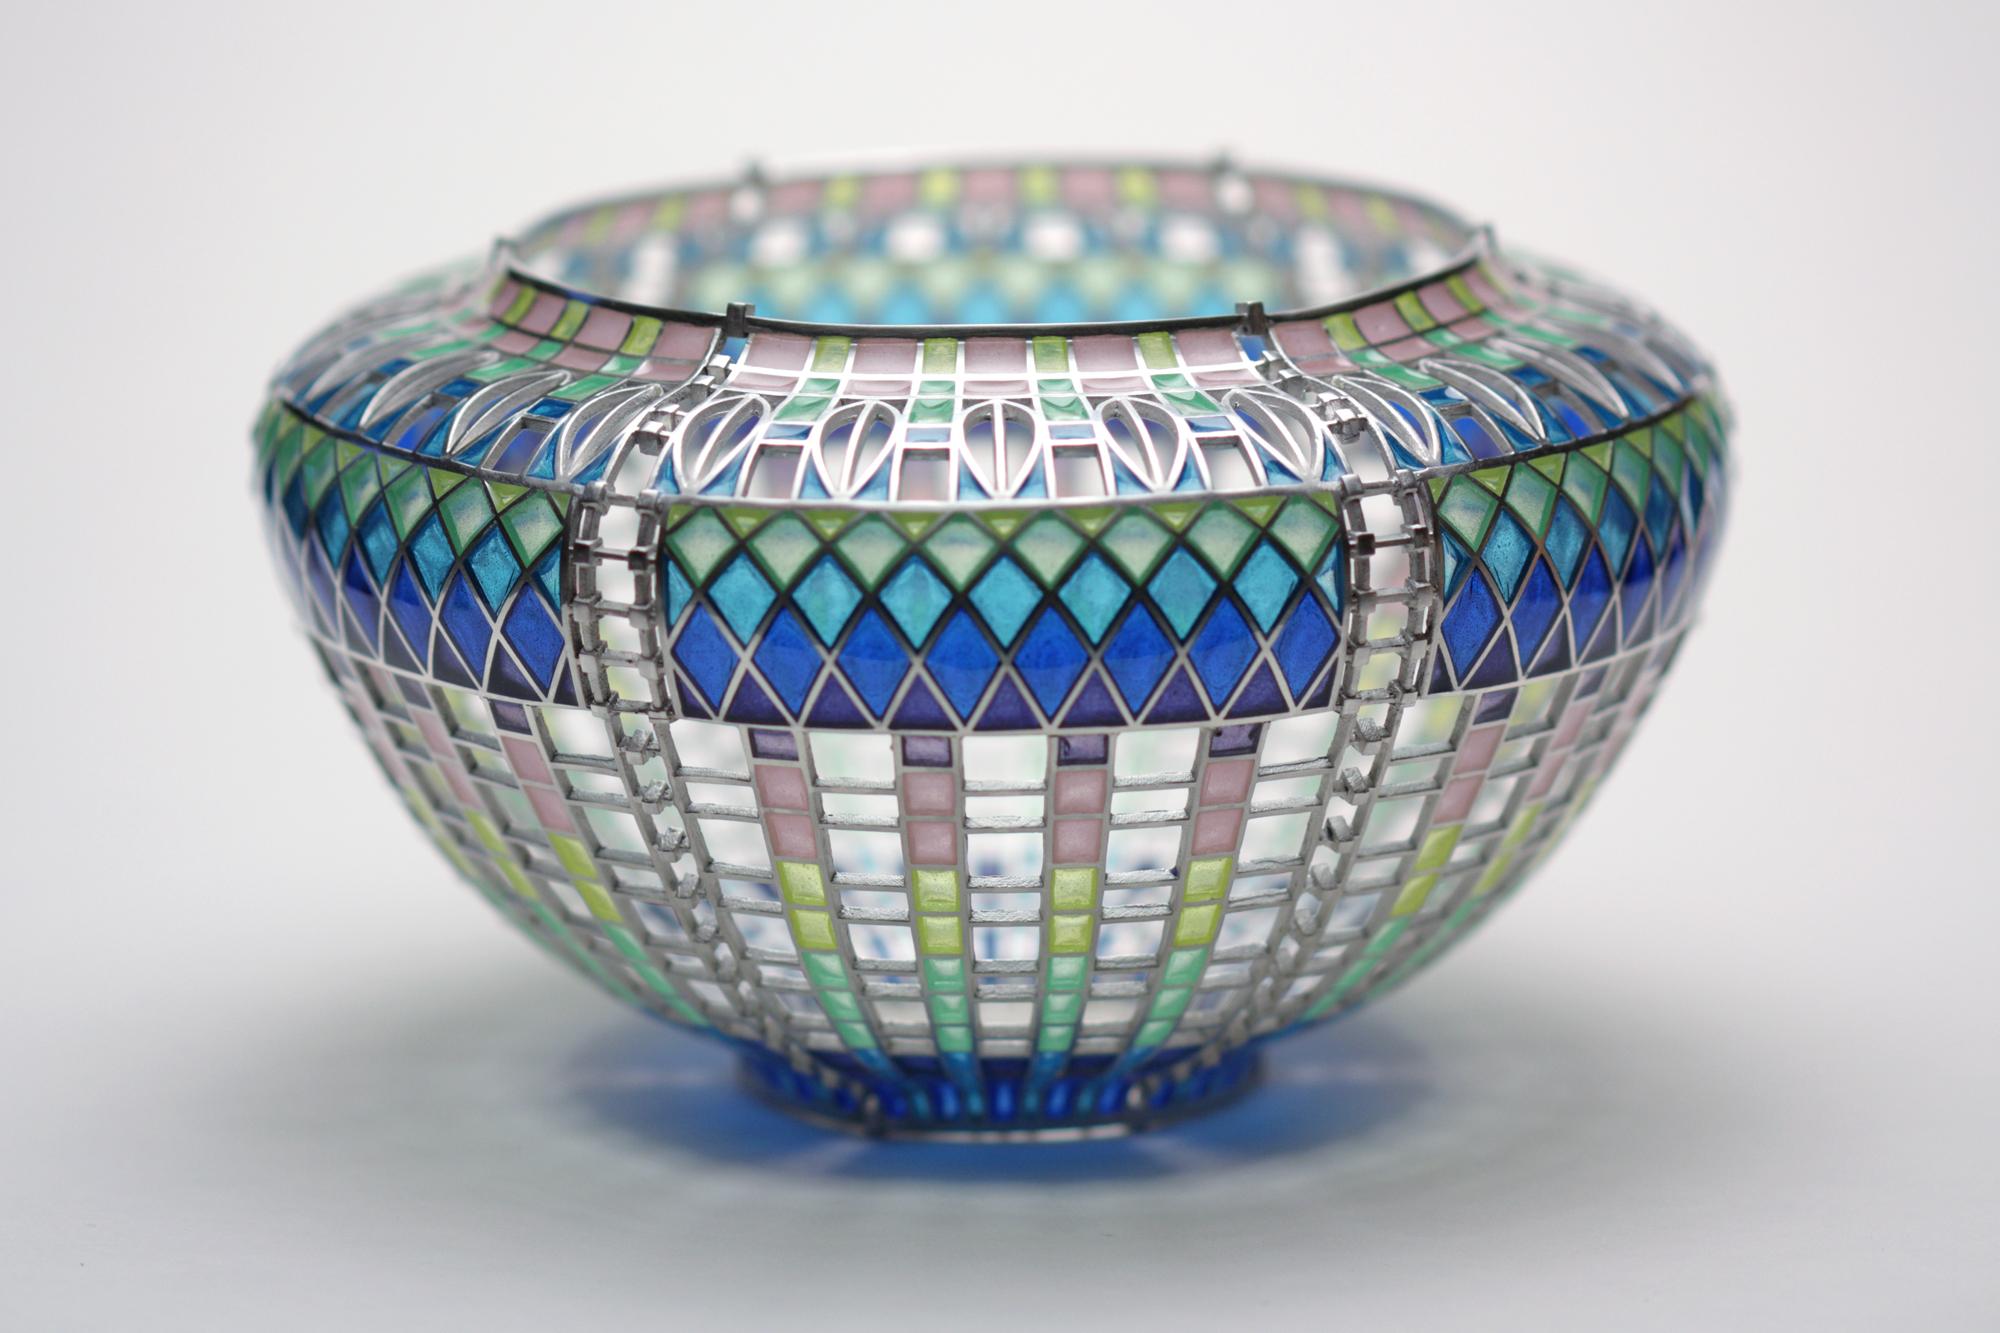 Luxor Bowl